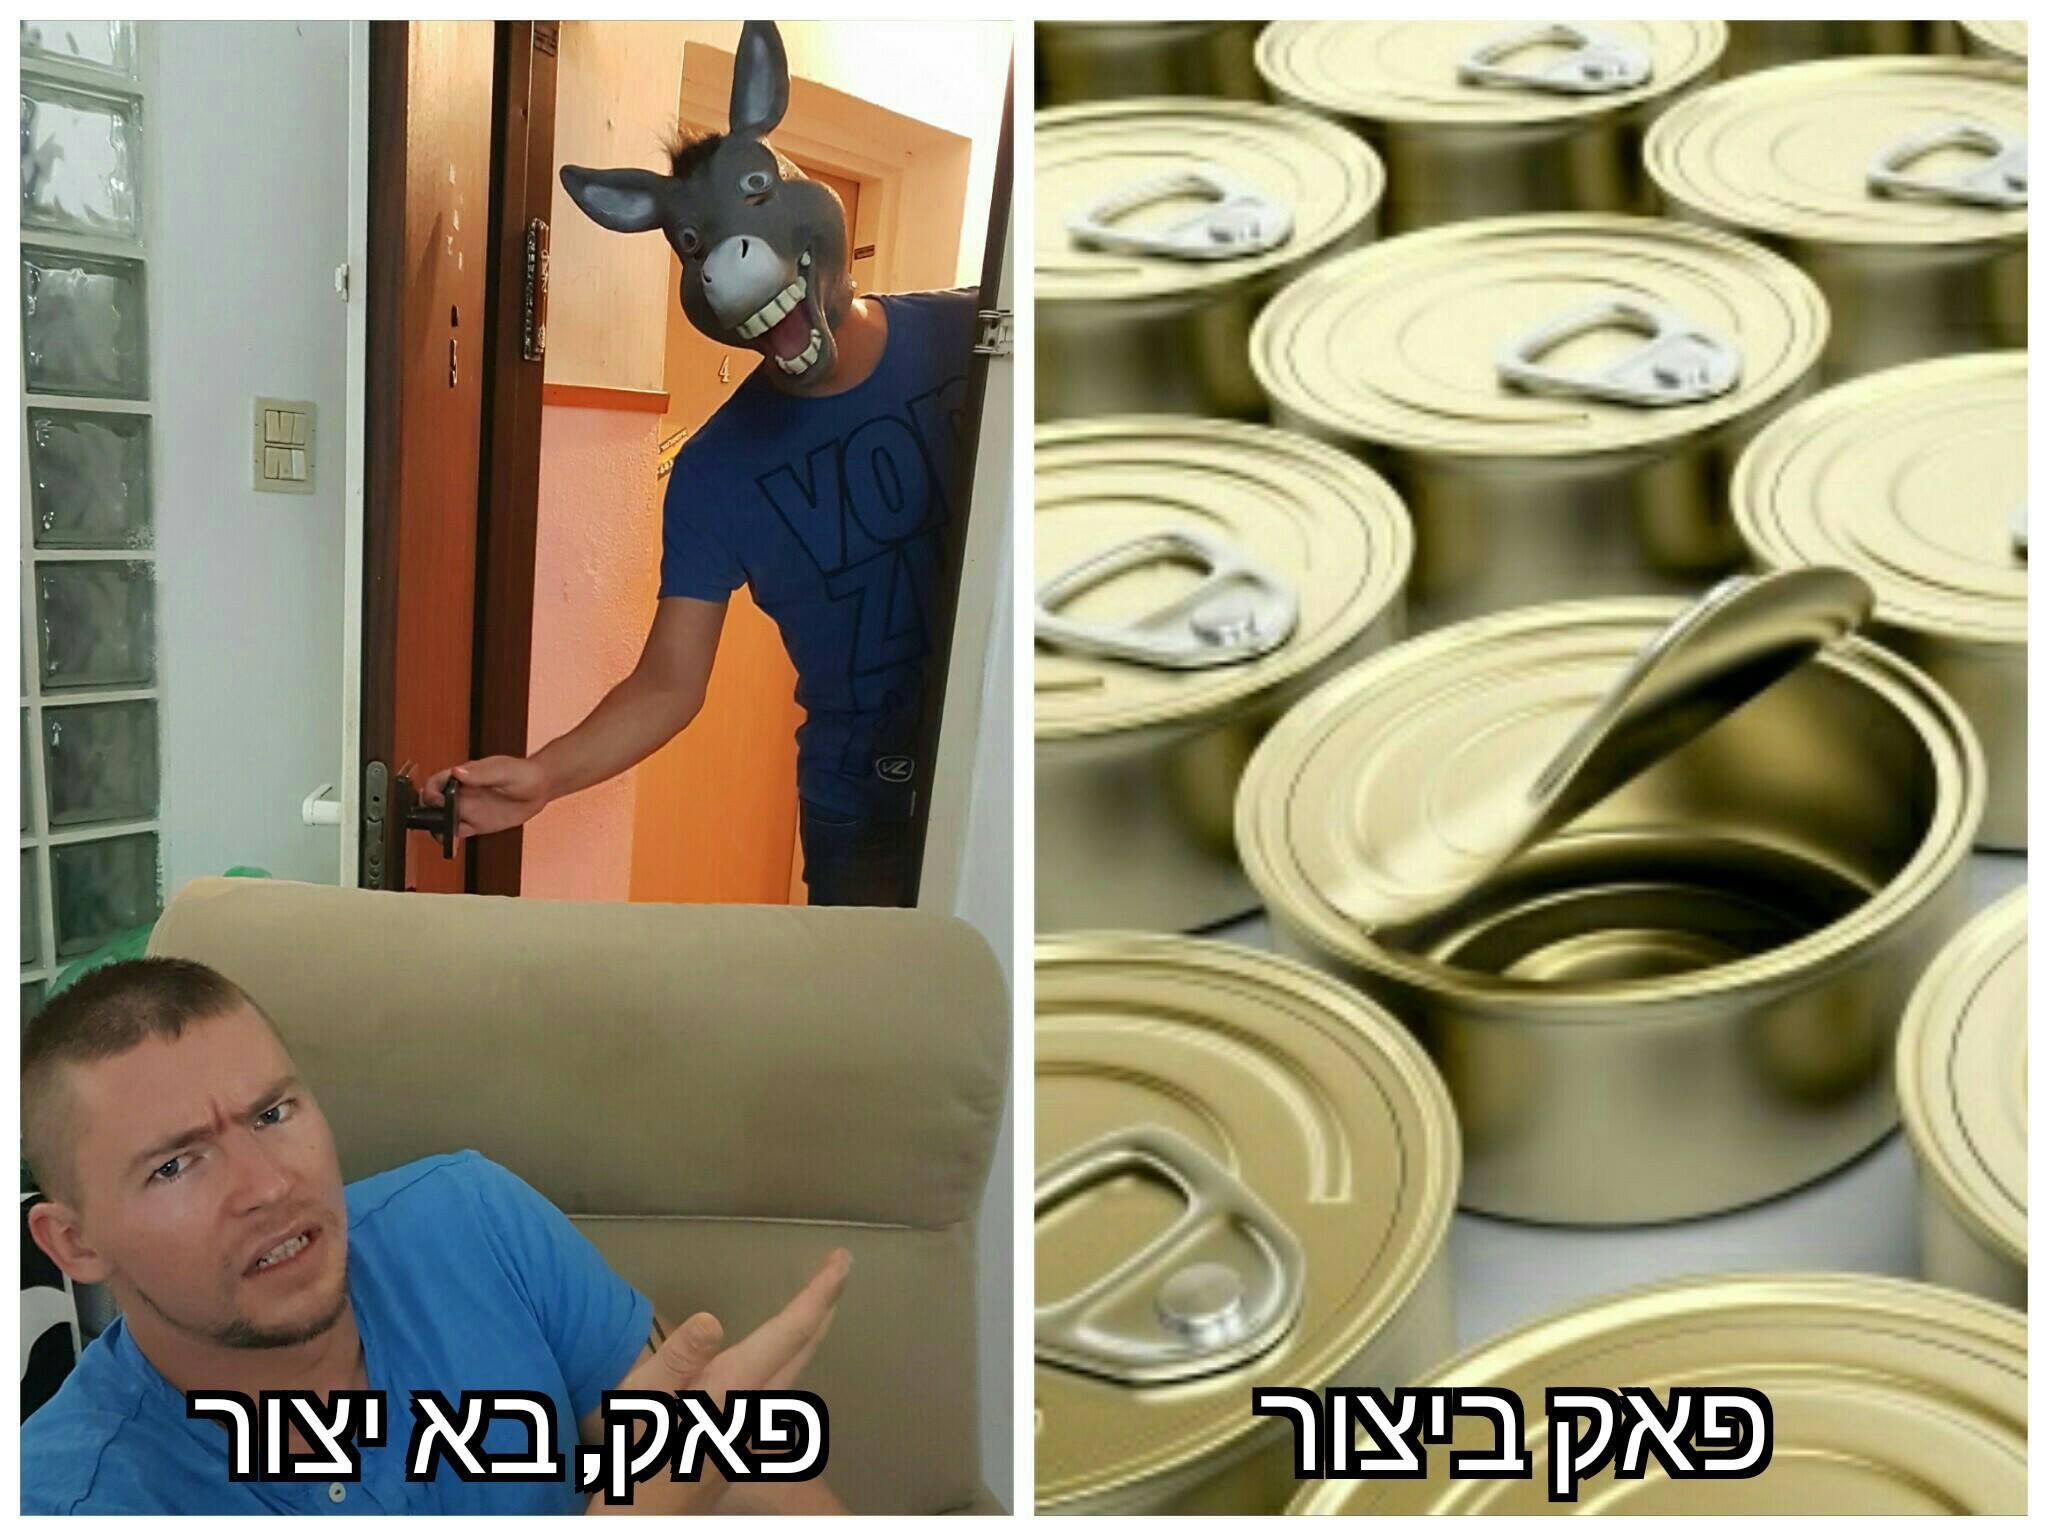 Artiom Jivetin and Aviv Yellin